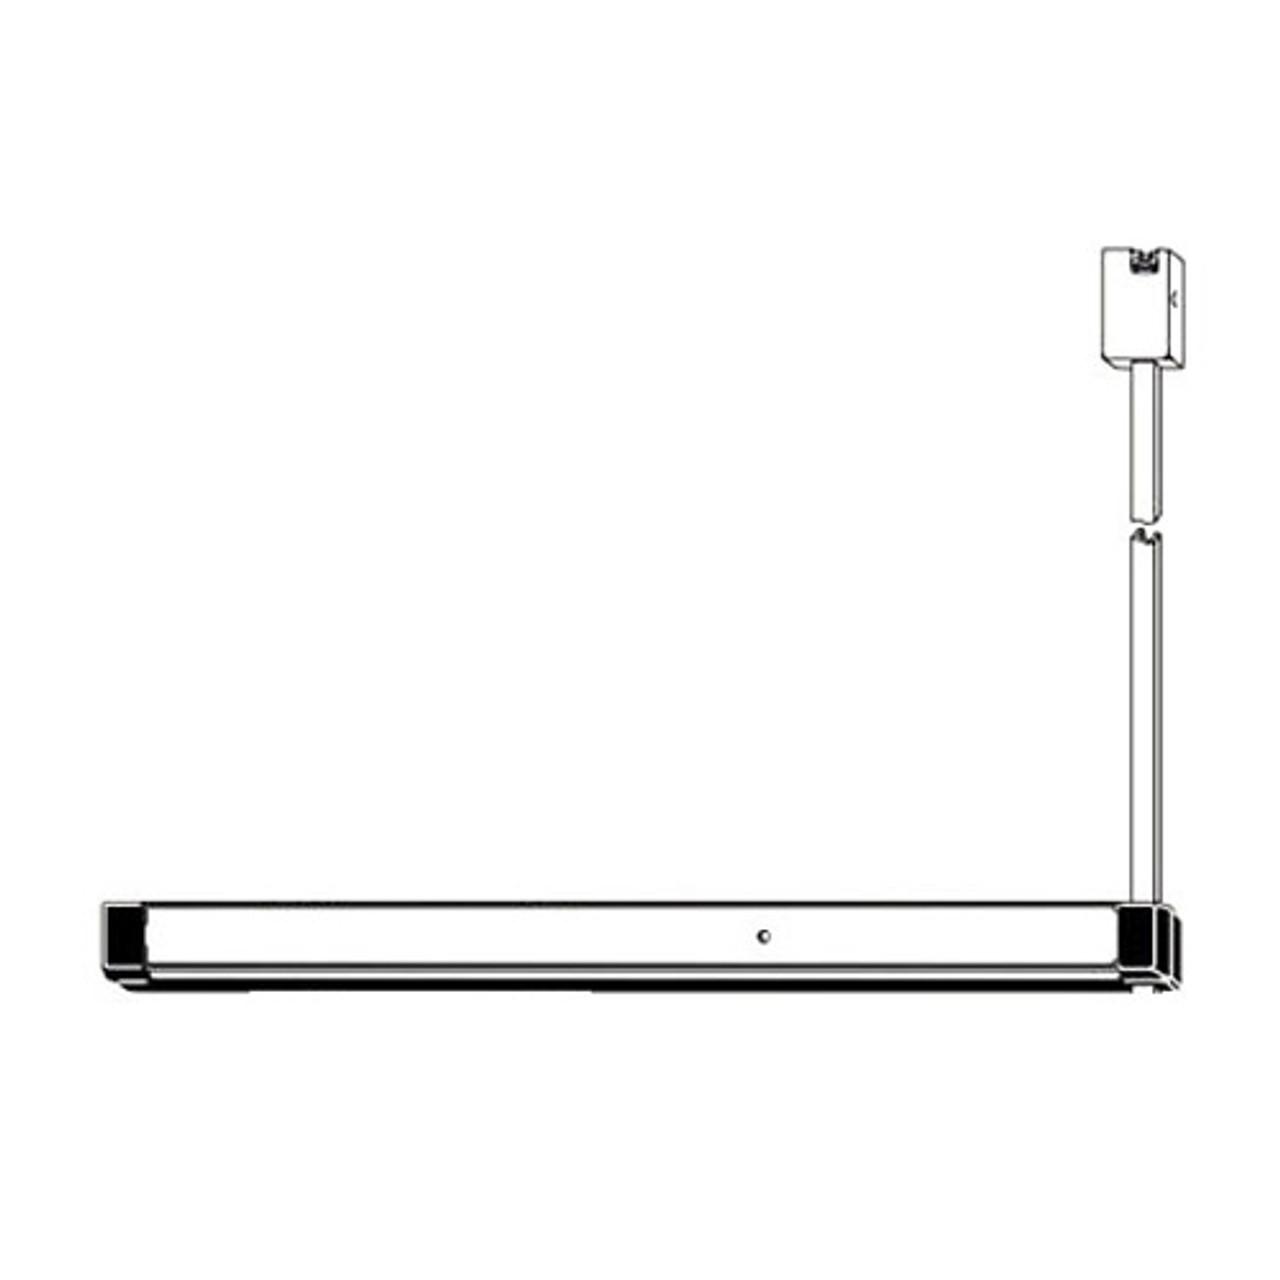 8222T-MLRM2-36 Adams Rite Narrow Stile Surface Vertical Rod Exit Device in Dark Bronze